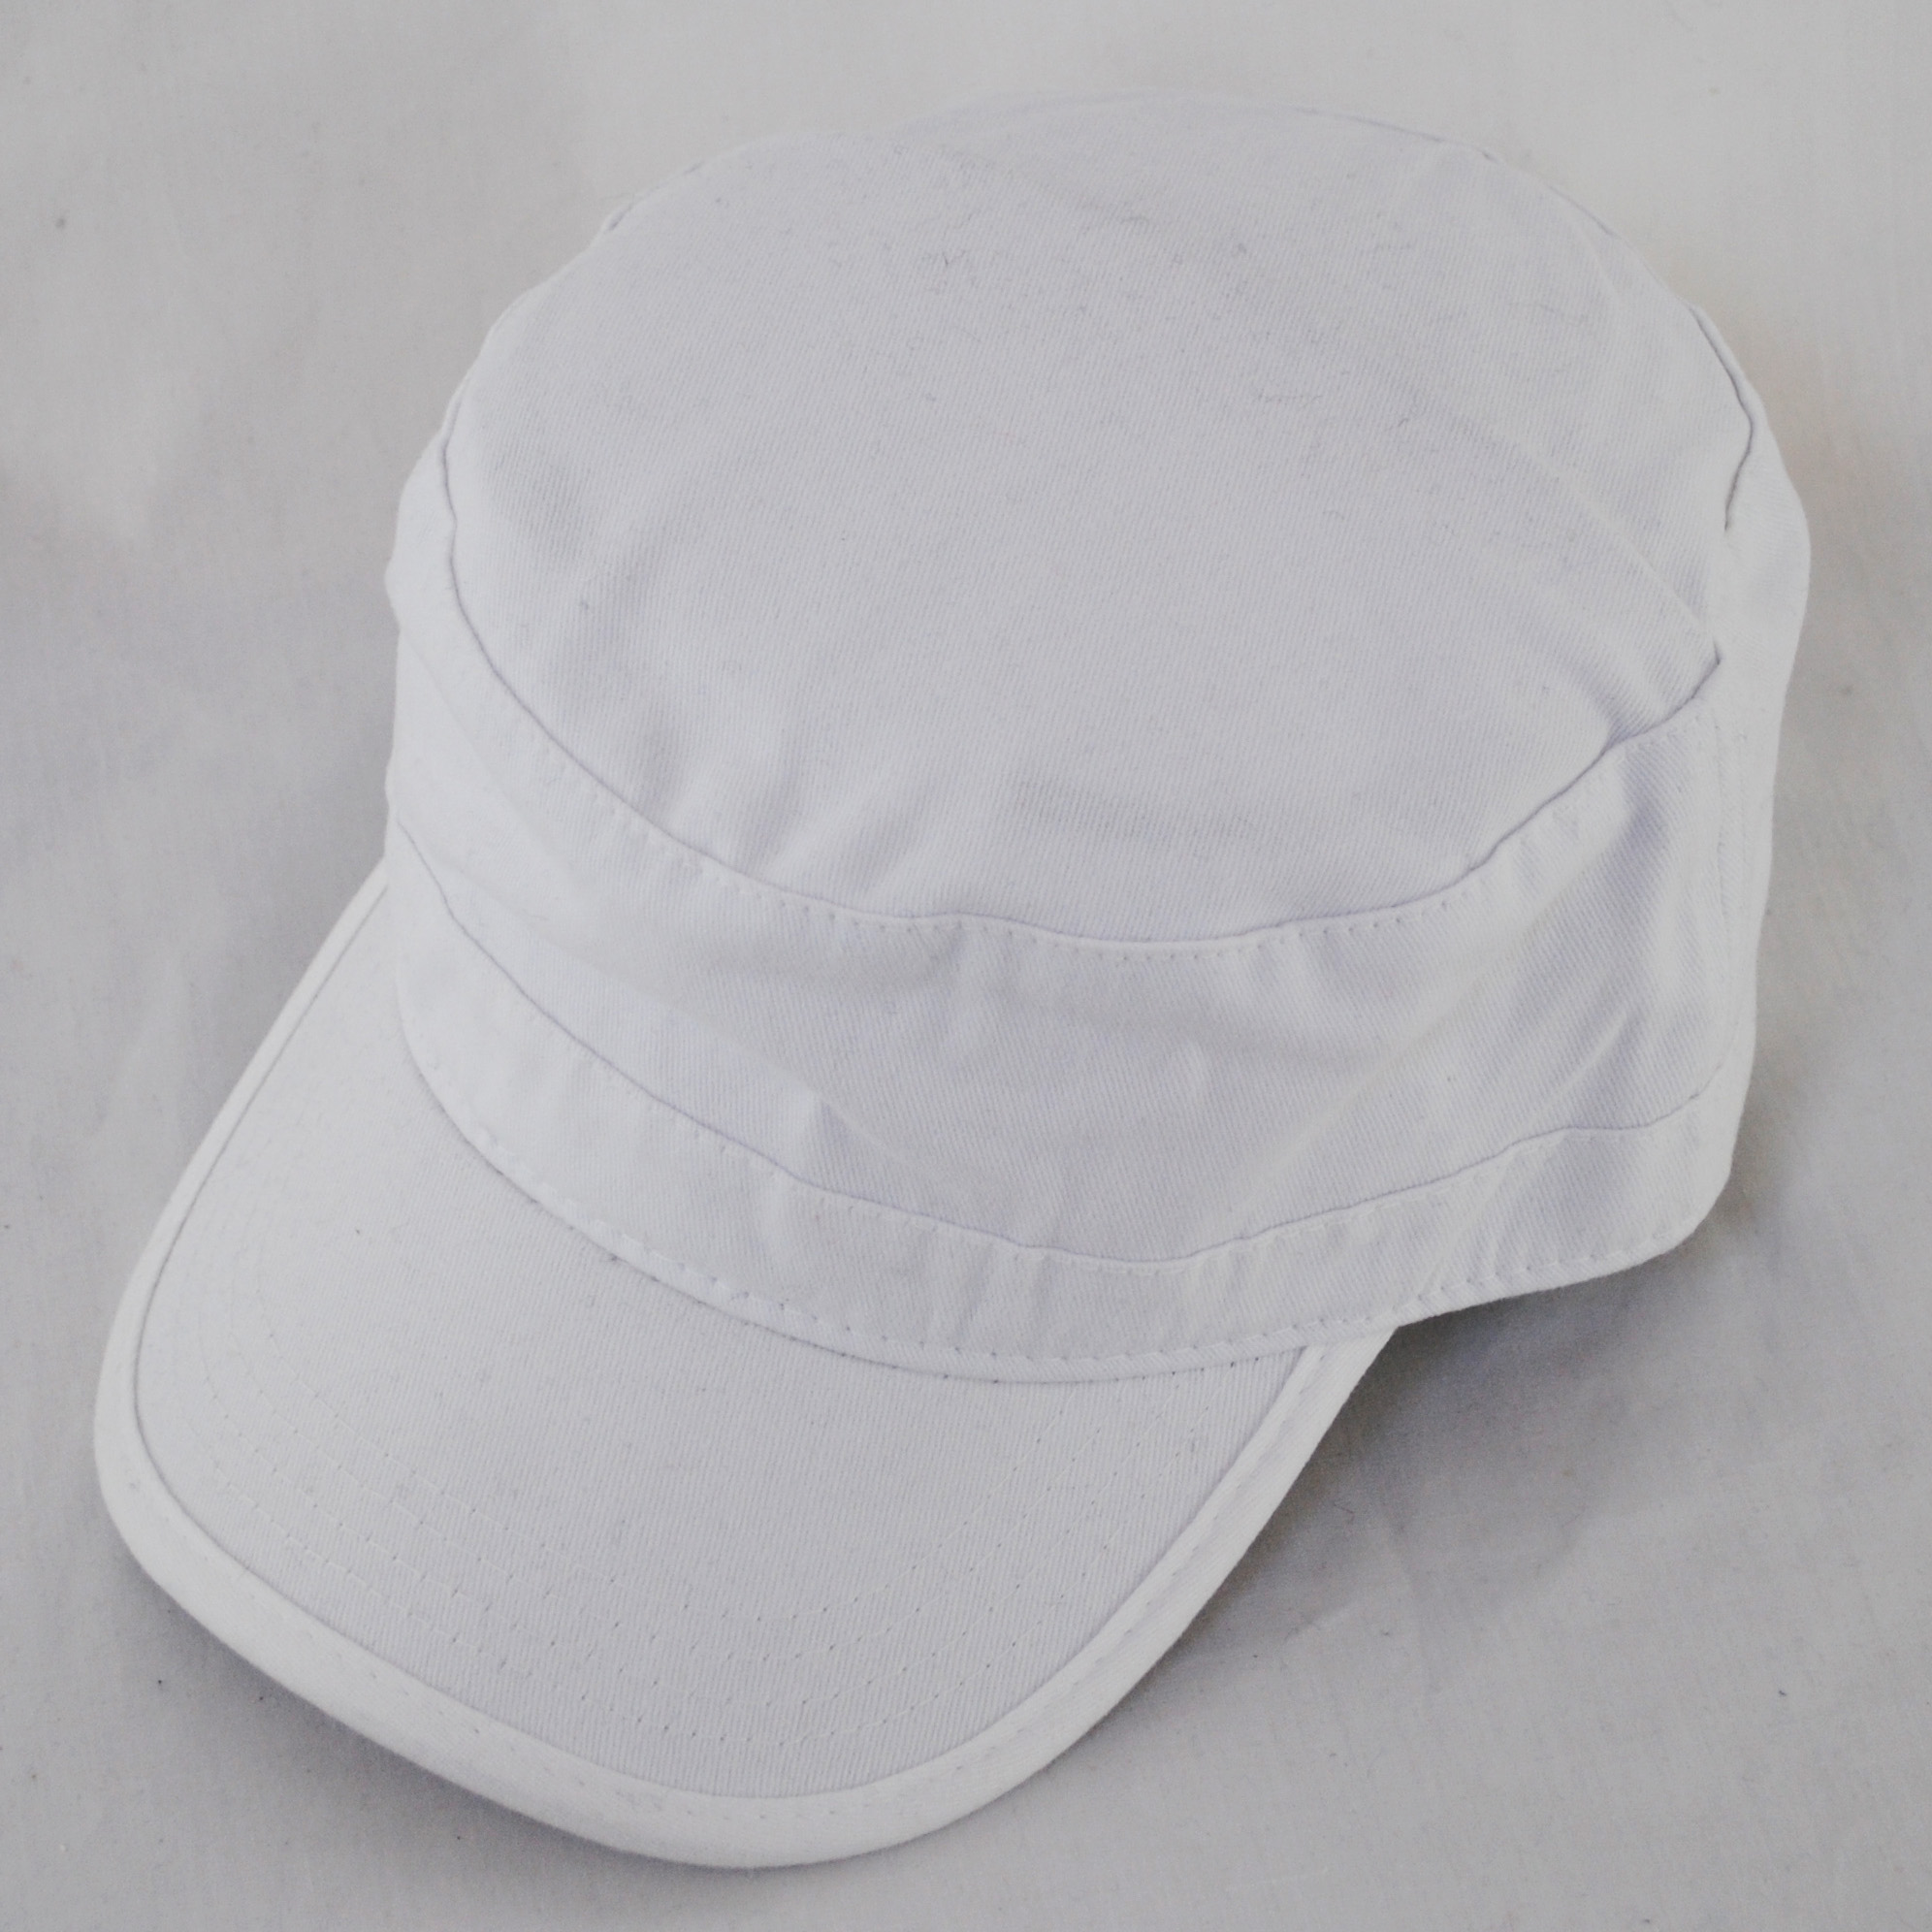 Target Plain Military Army Tank Bdu Baseball Cap Hat Black